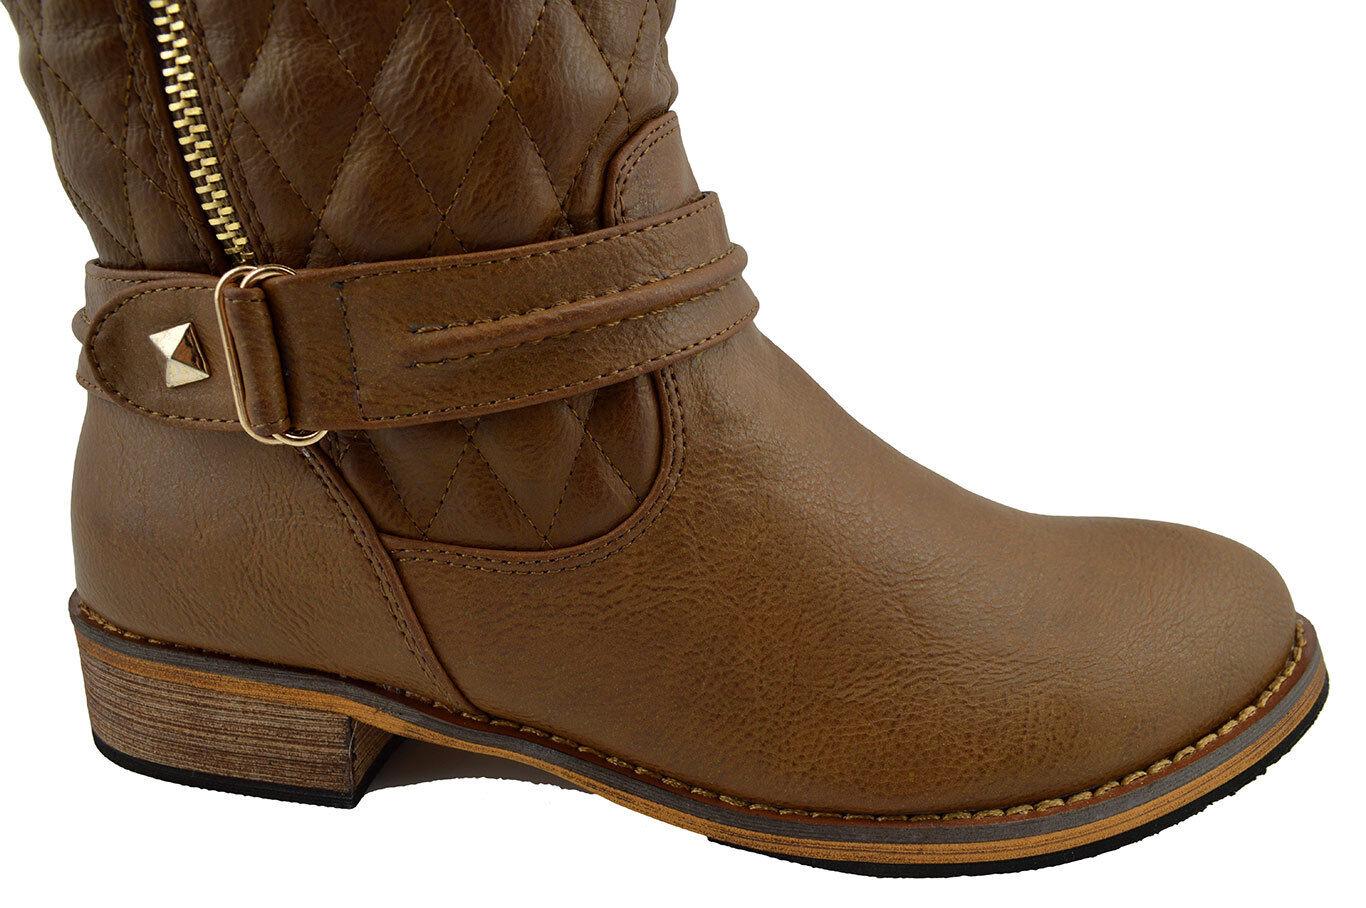 150 Braun Fashion Riding Knee High BOOTS Damens Schuhes NEU COLLECTION